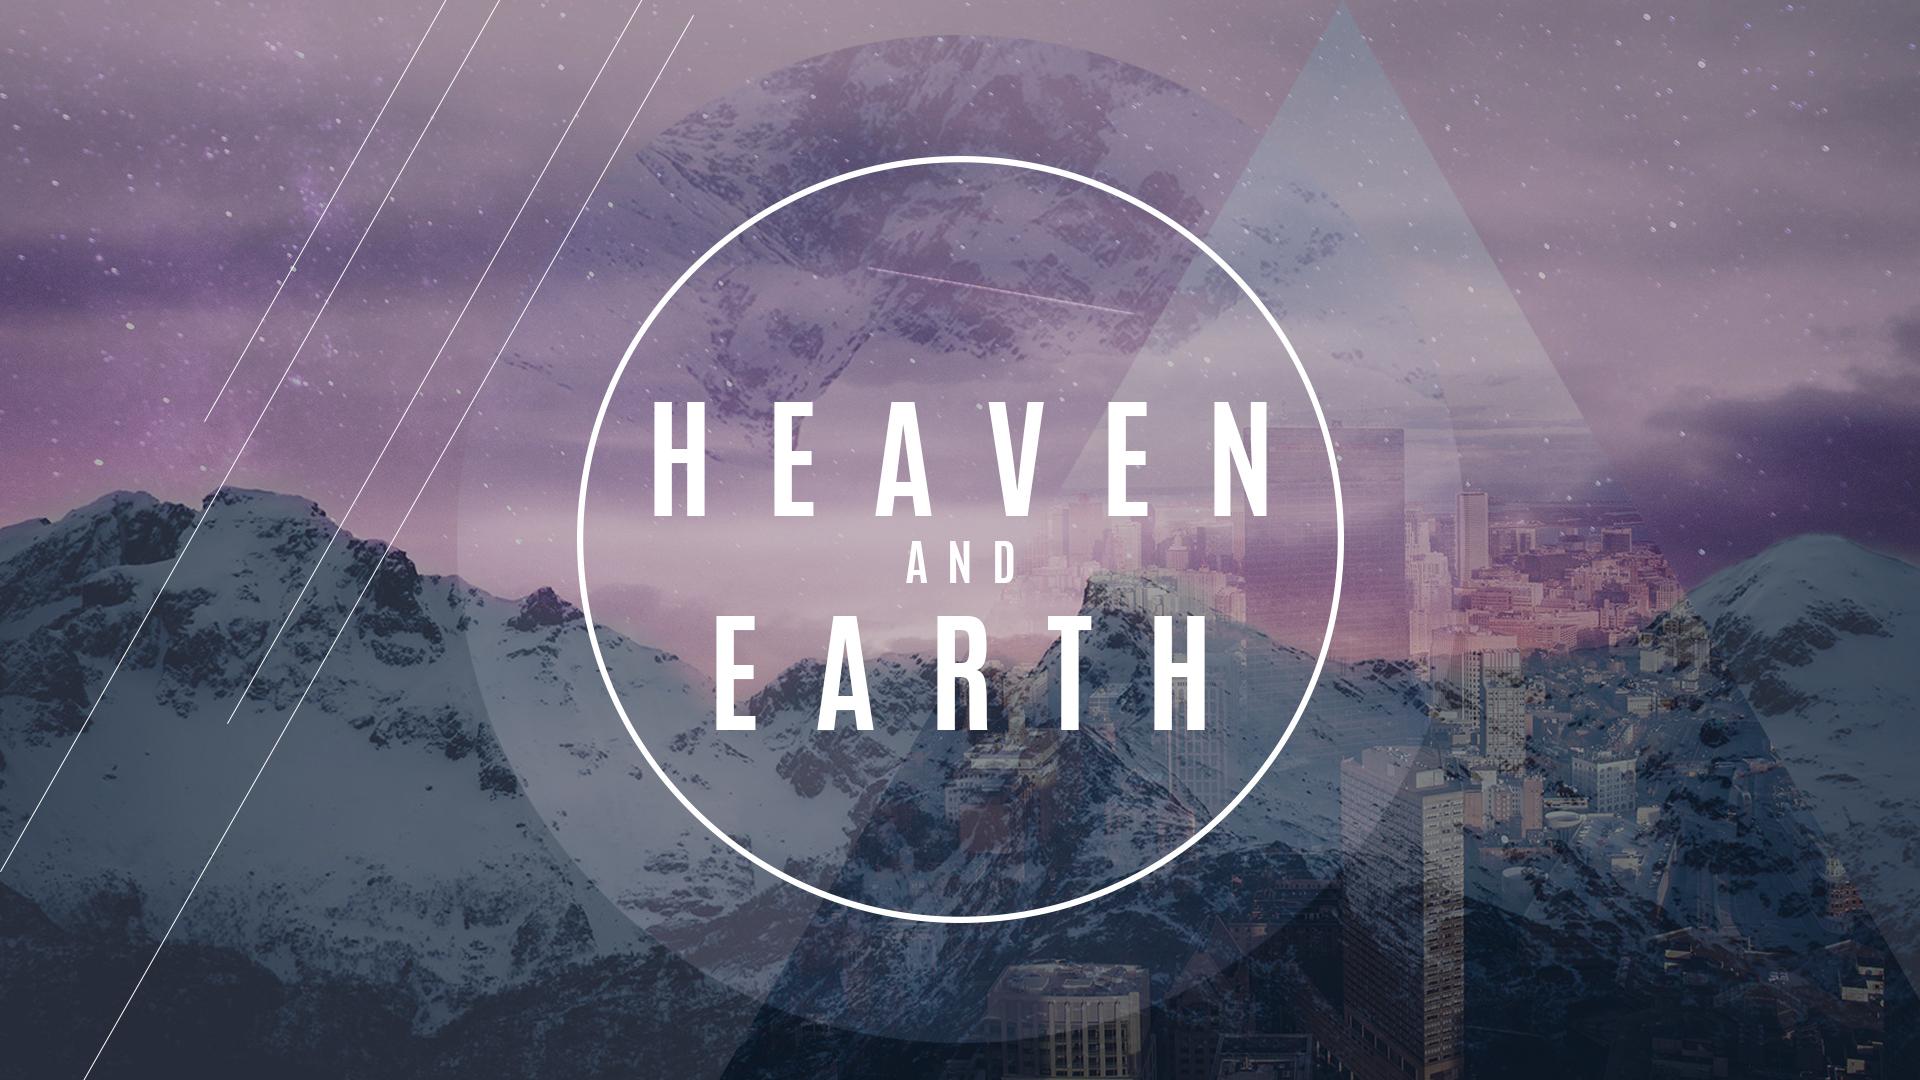 PLTFORM-HeavenAndEarth-1080.jpg